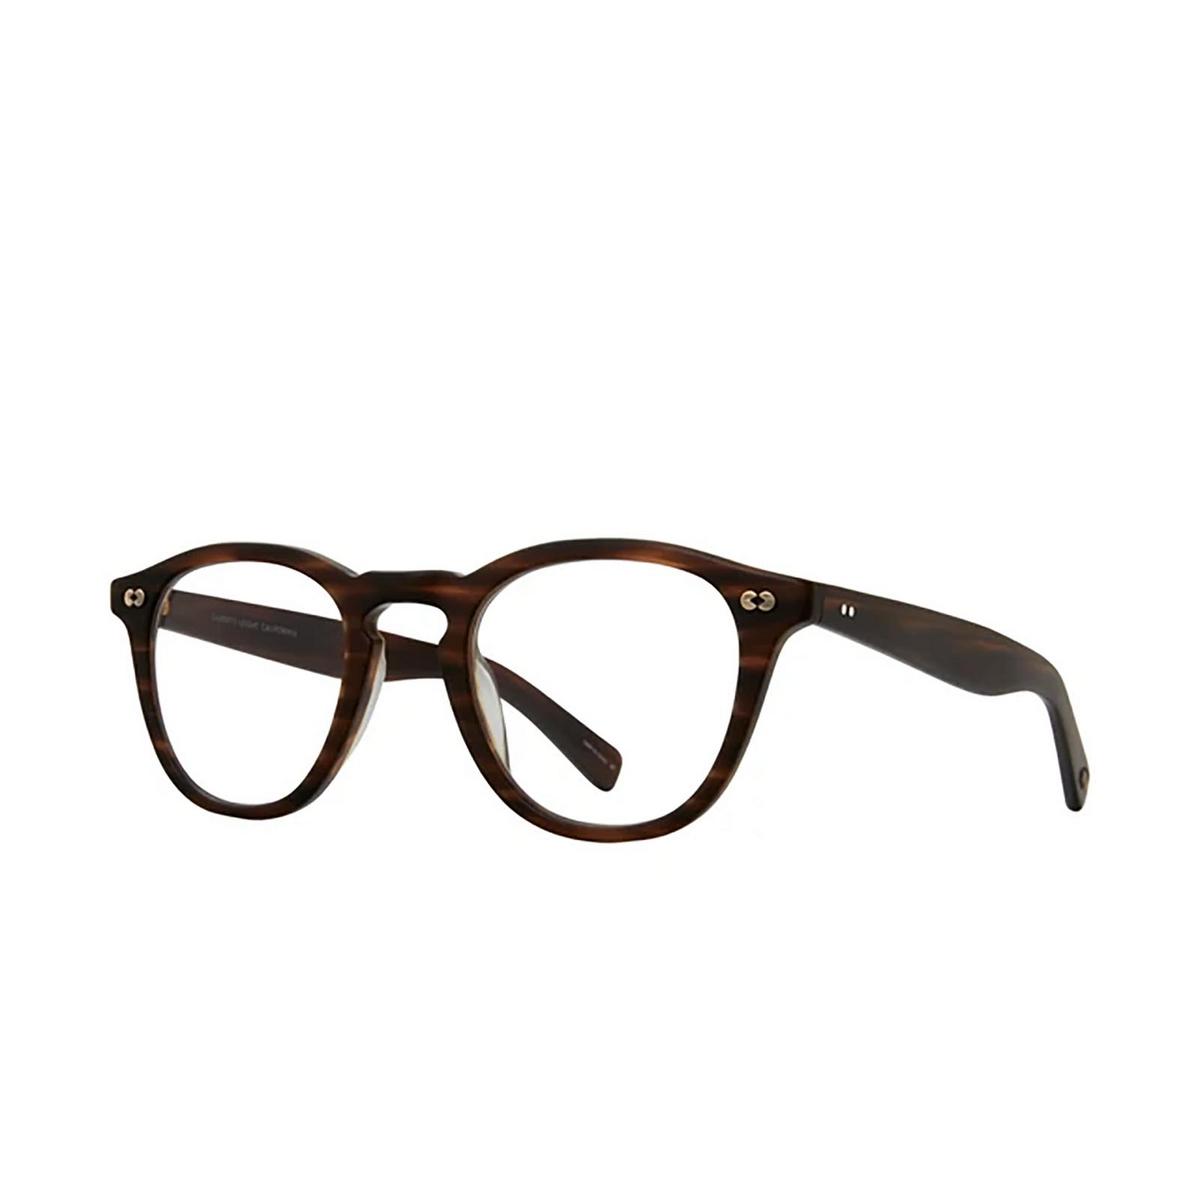 Garrett Leight® Square Eyeglasses: Hampton X color Matte Brandy Tort Mbrt - three-quarters view.